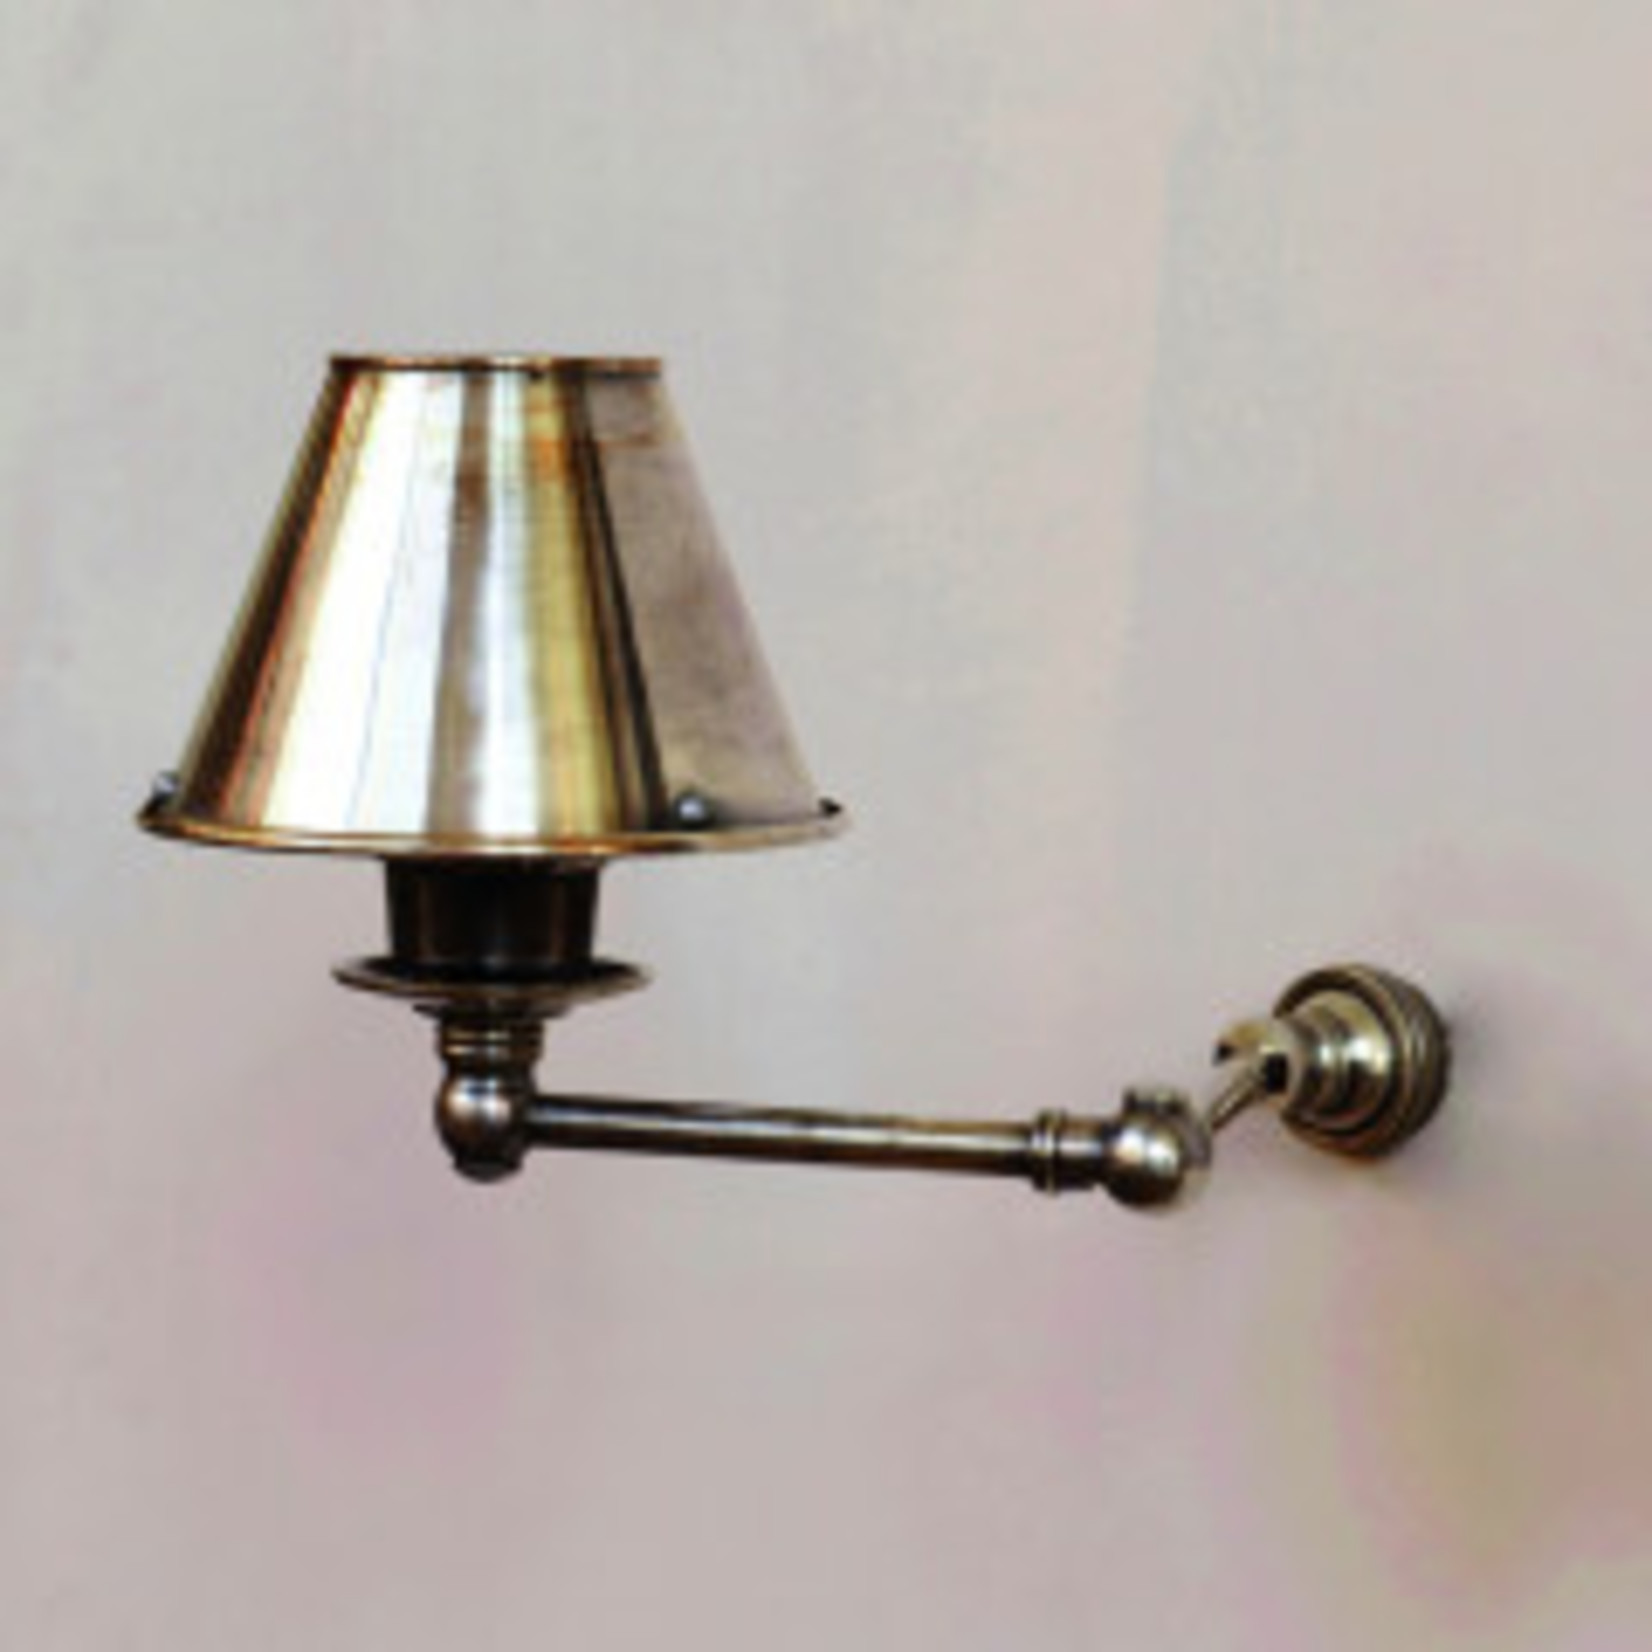 CHEHOMA WALL SCONCE 16CM NICKEL WALL LAMP